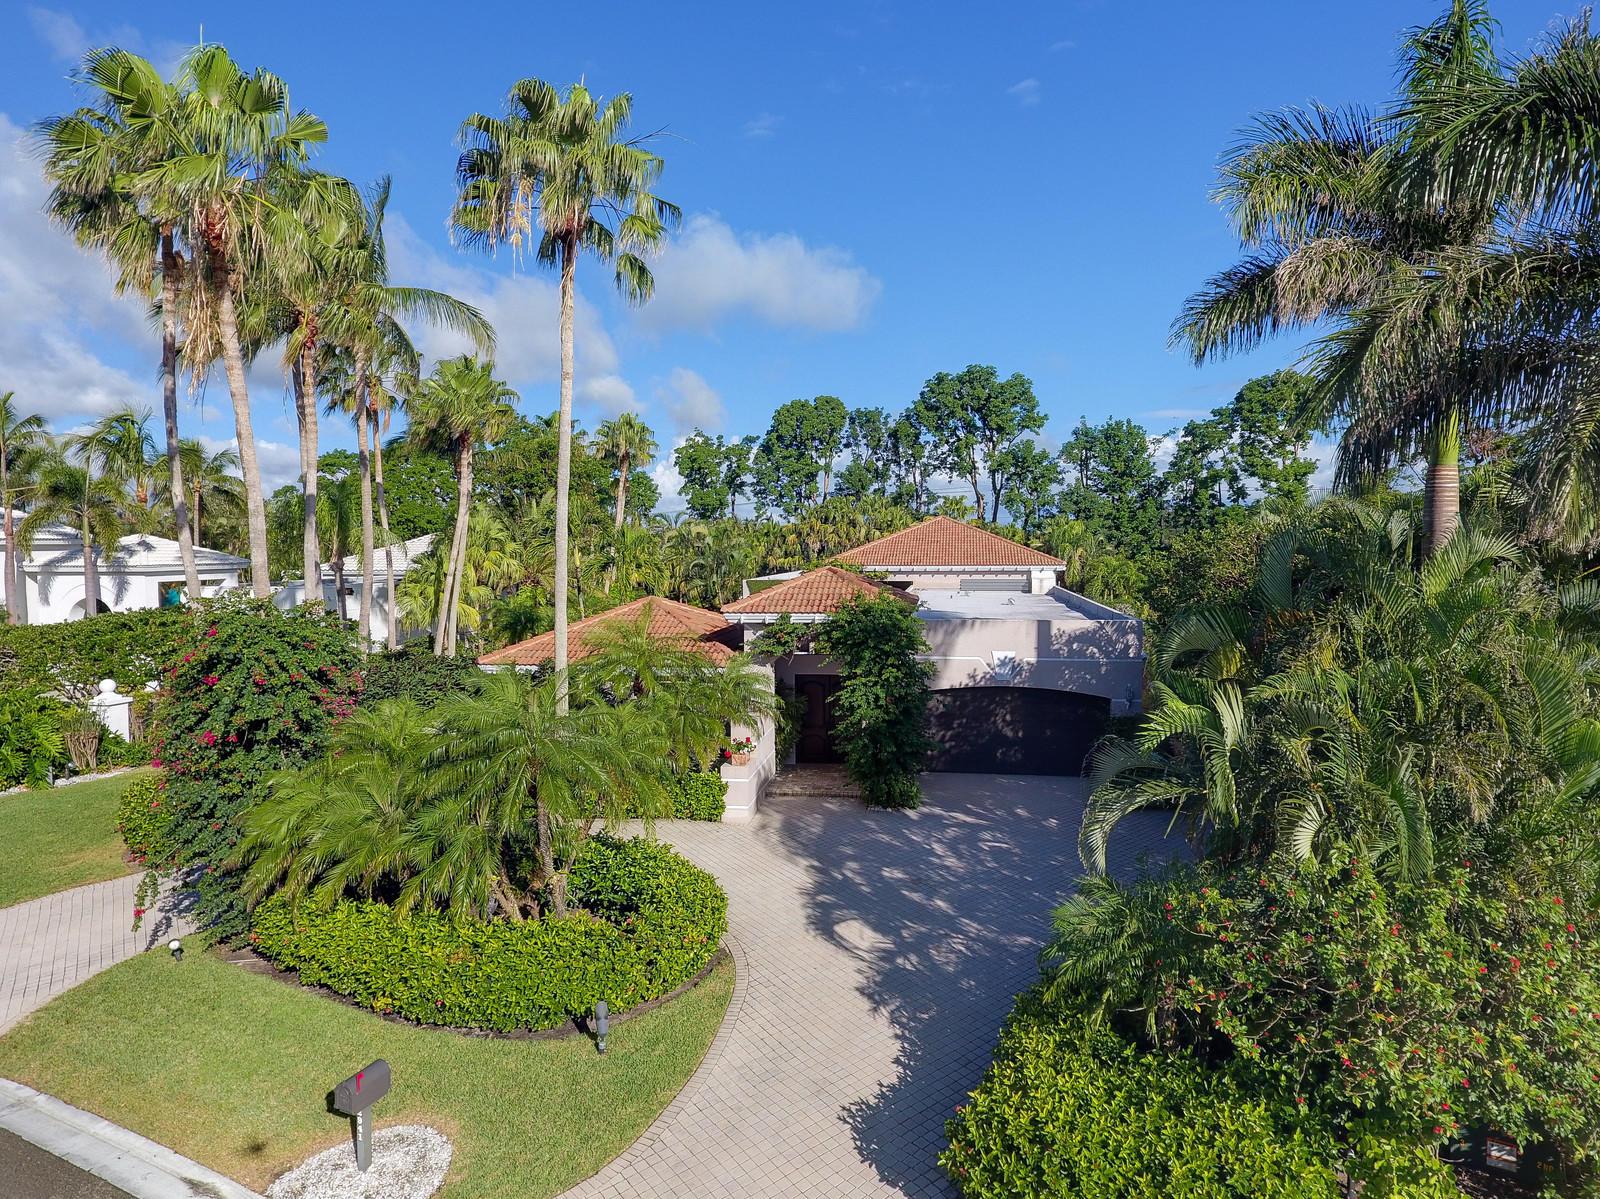 2941 Le Bateau Drive, Palm Beach Gardens, Florida 33410, 5 Bedrooms Bedrooms, ,4.1 BathroomsBathrooms,A,Single family,Le Bateau,RX-10461878